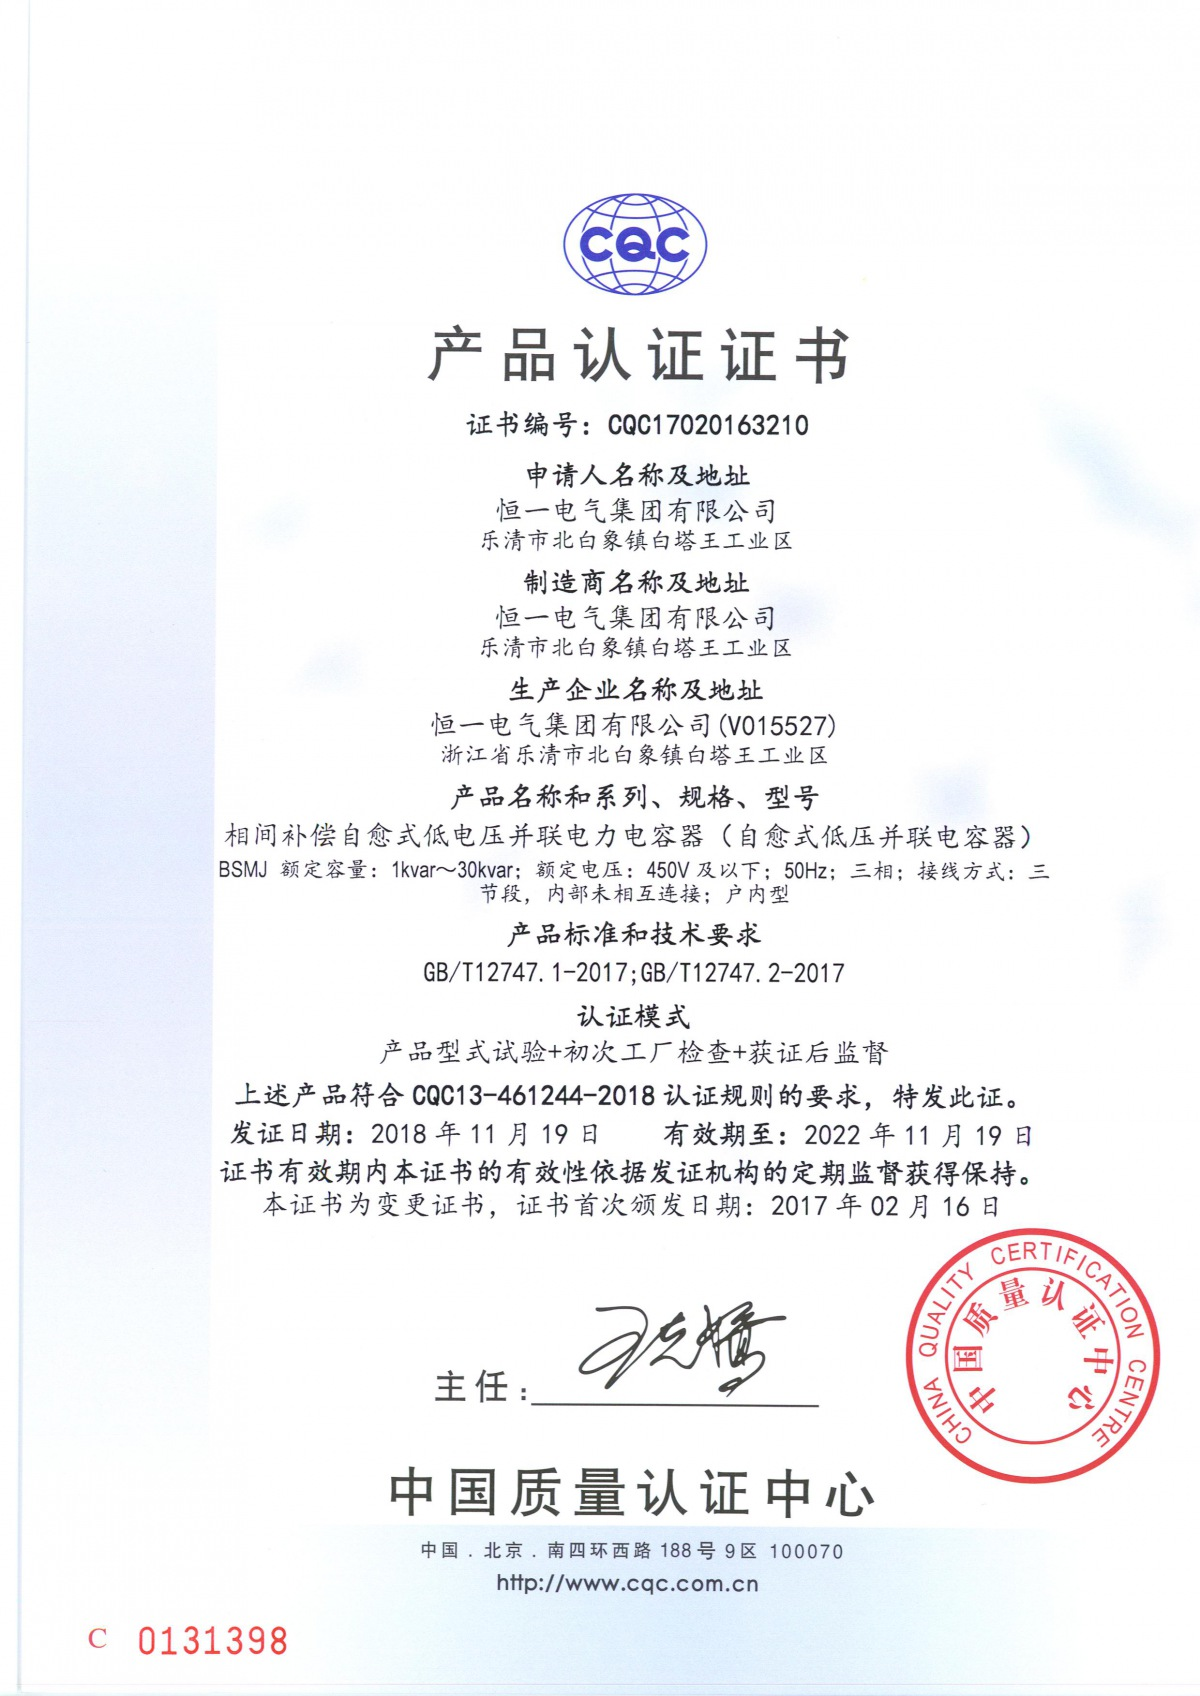 BSMJ相间 中文